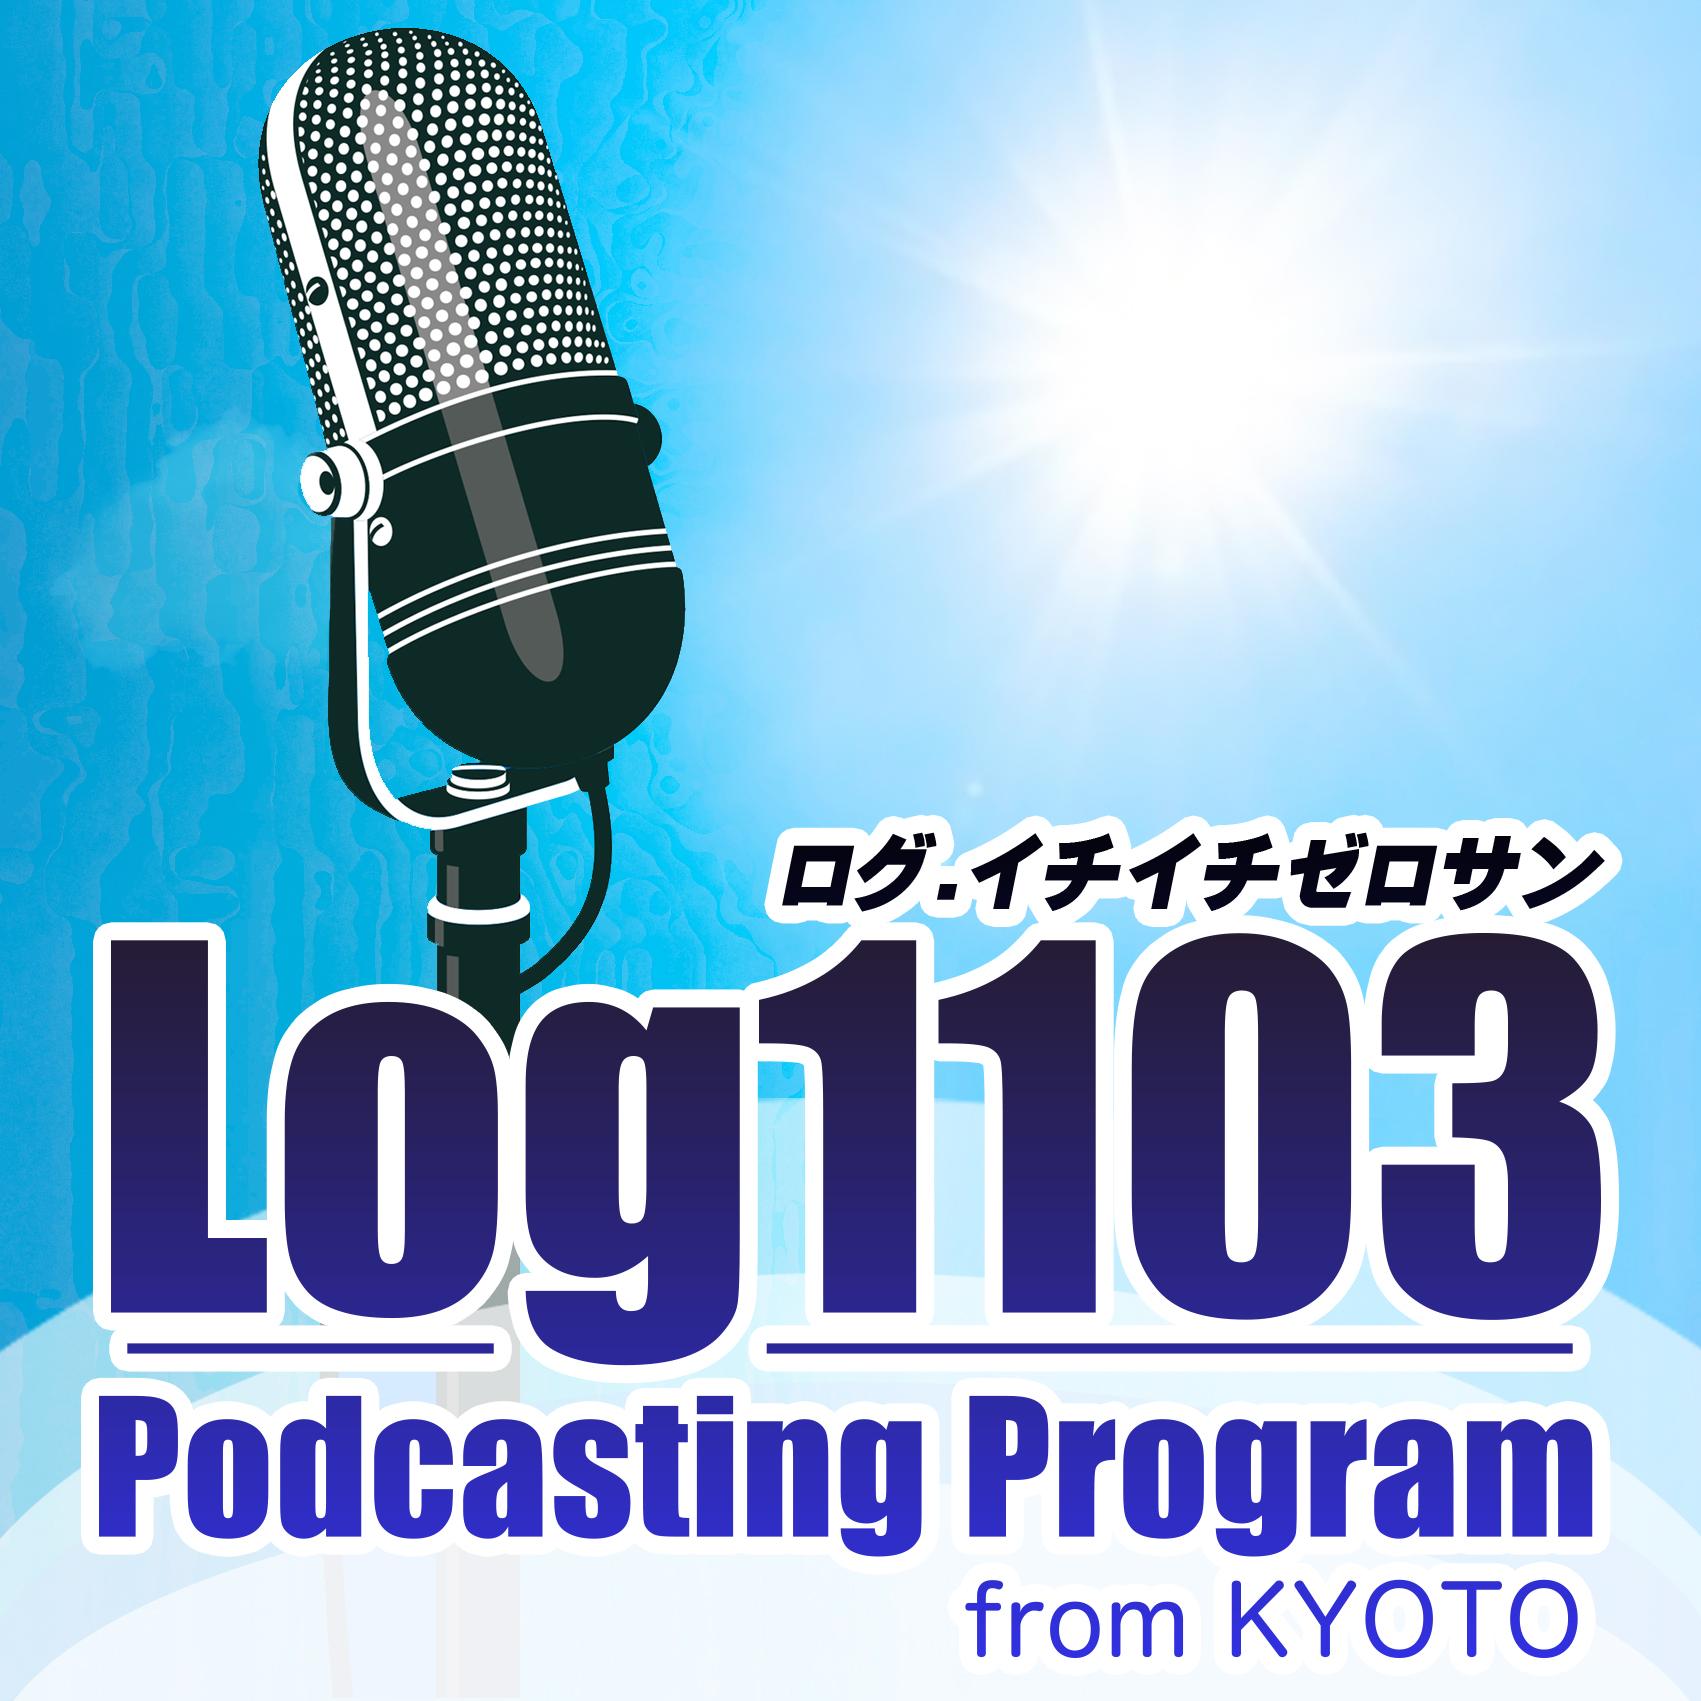 Log1103